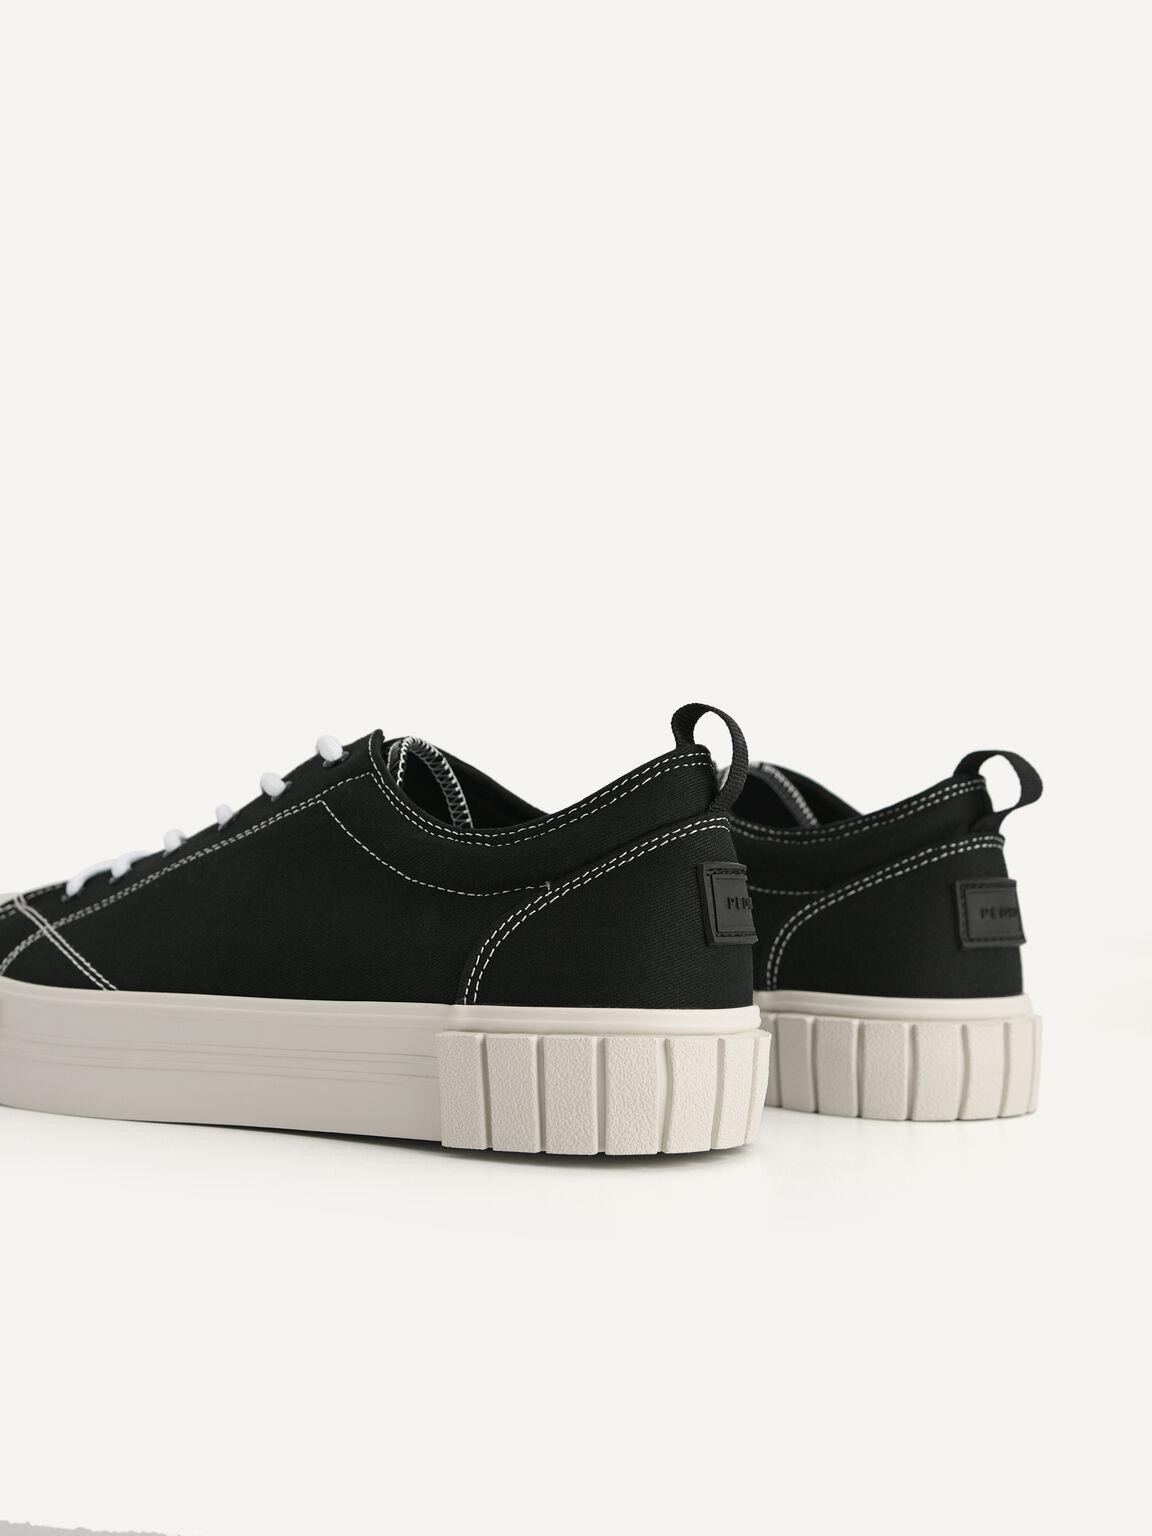 Beat Court Sneakers, Black, hi-res